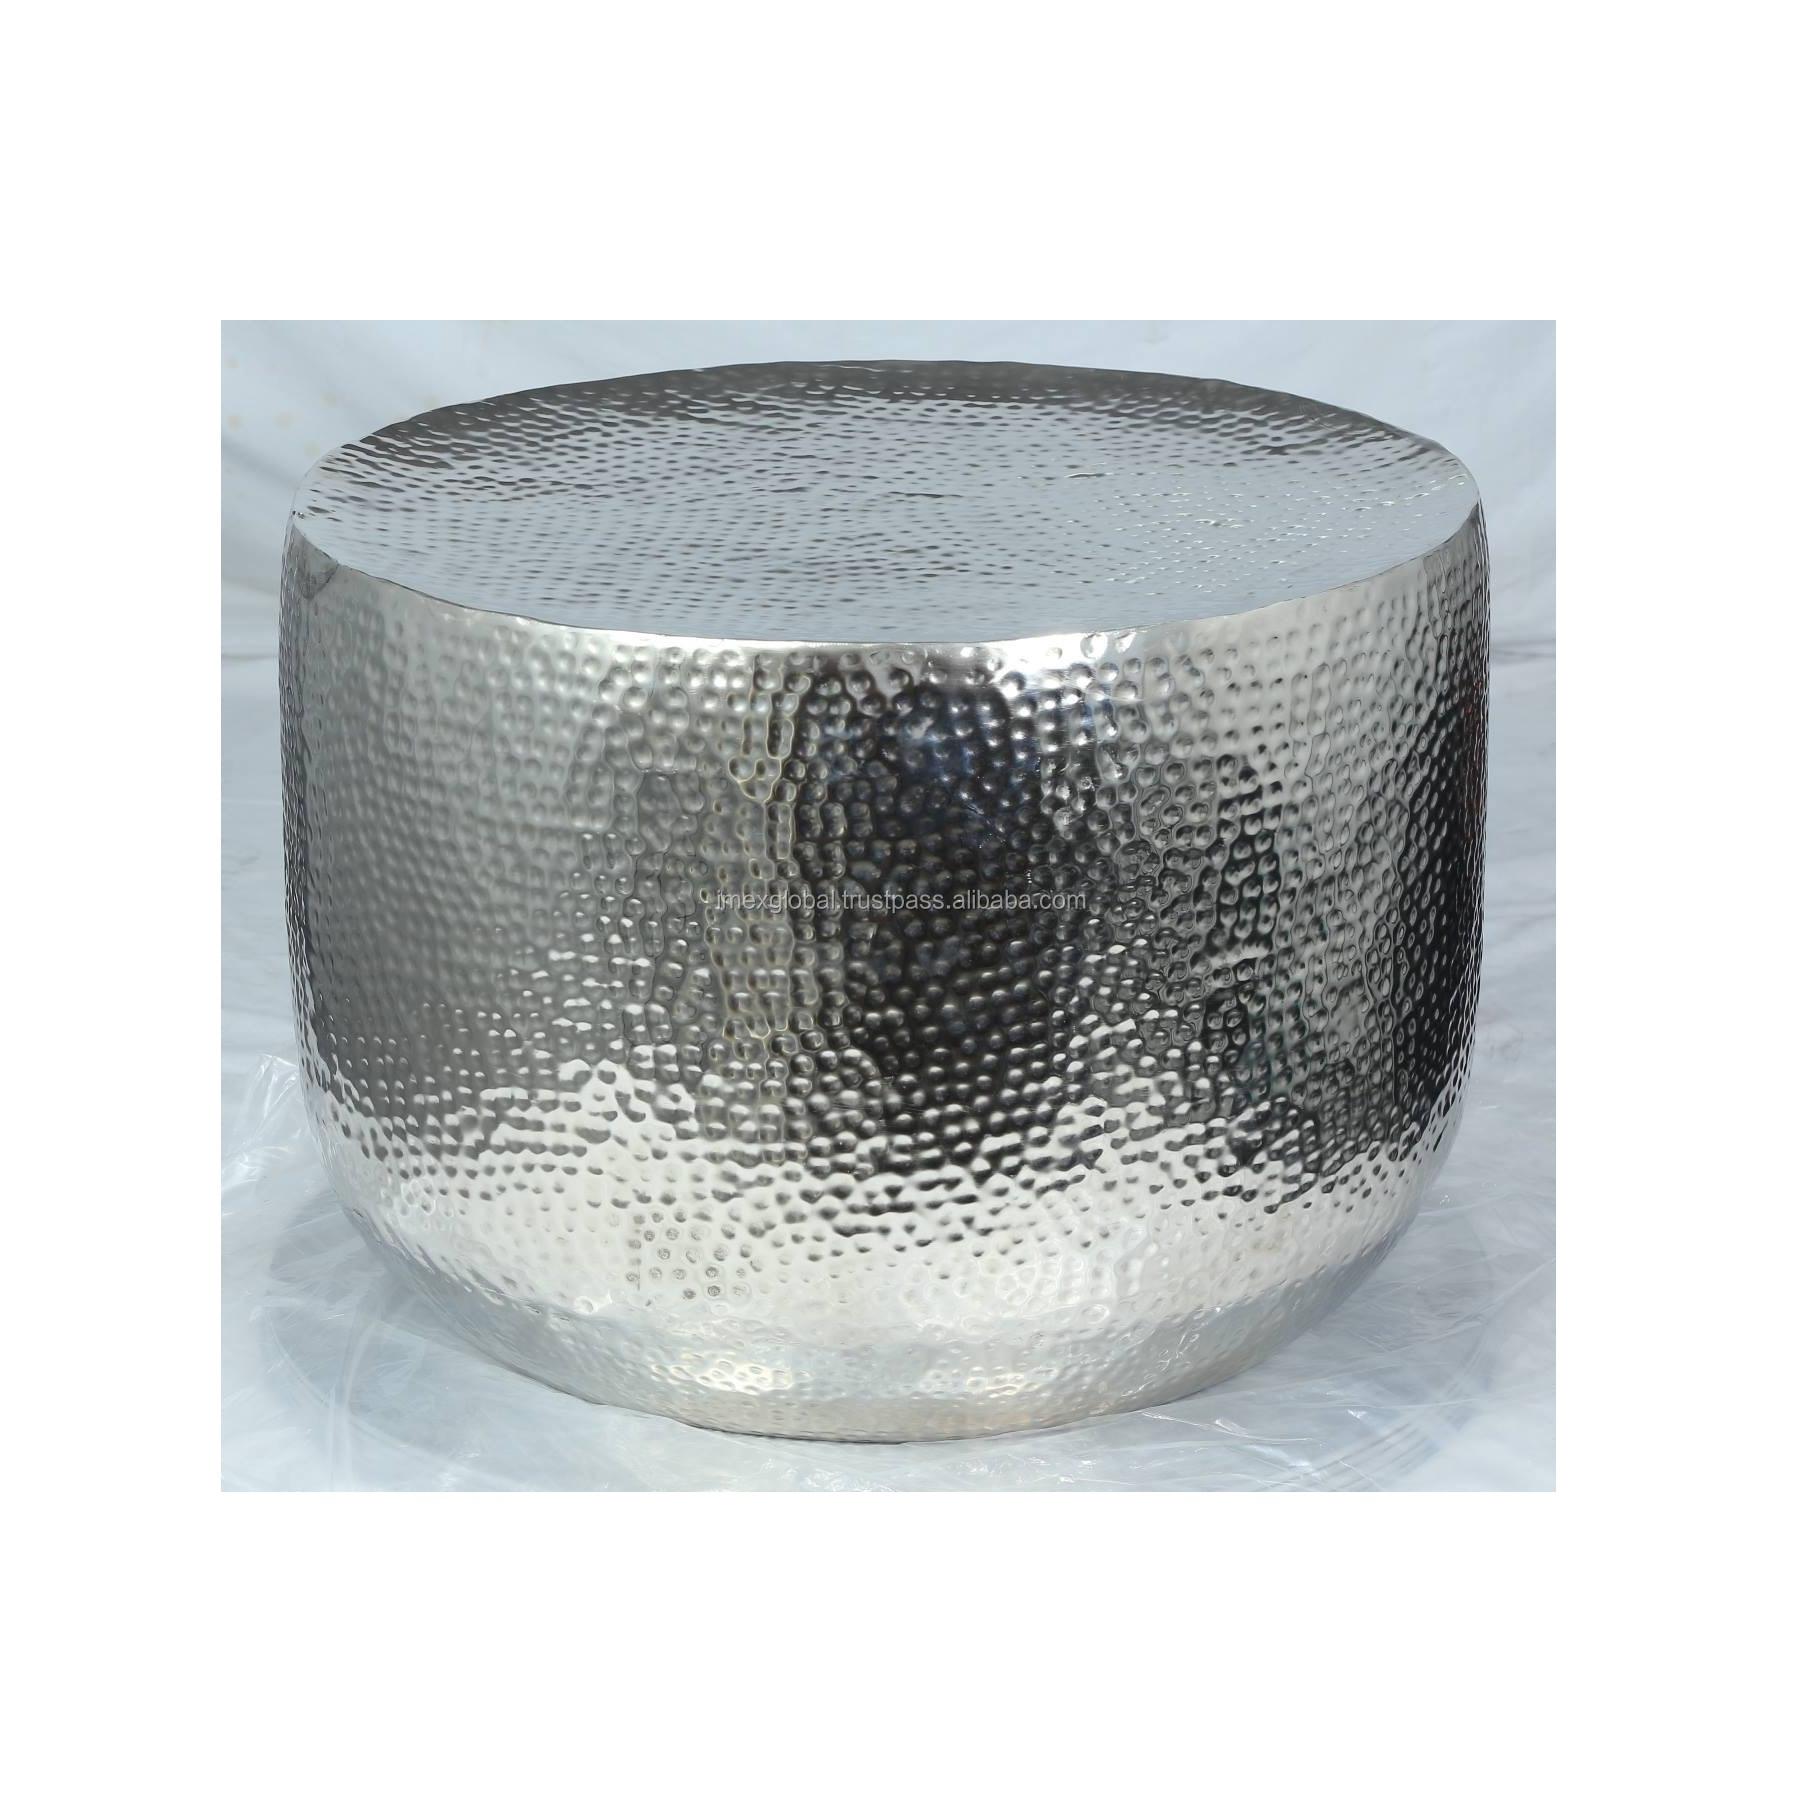 - Aluminum Hammered Round Coffee Table - Buy Aluminum Hammered Round